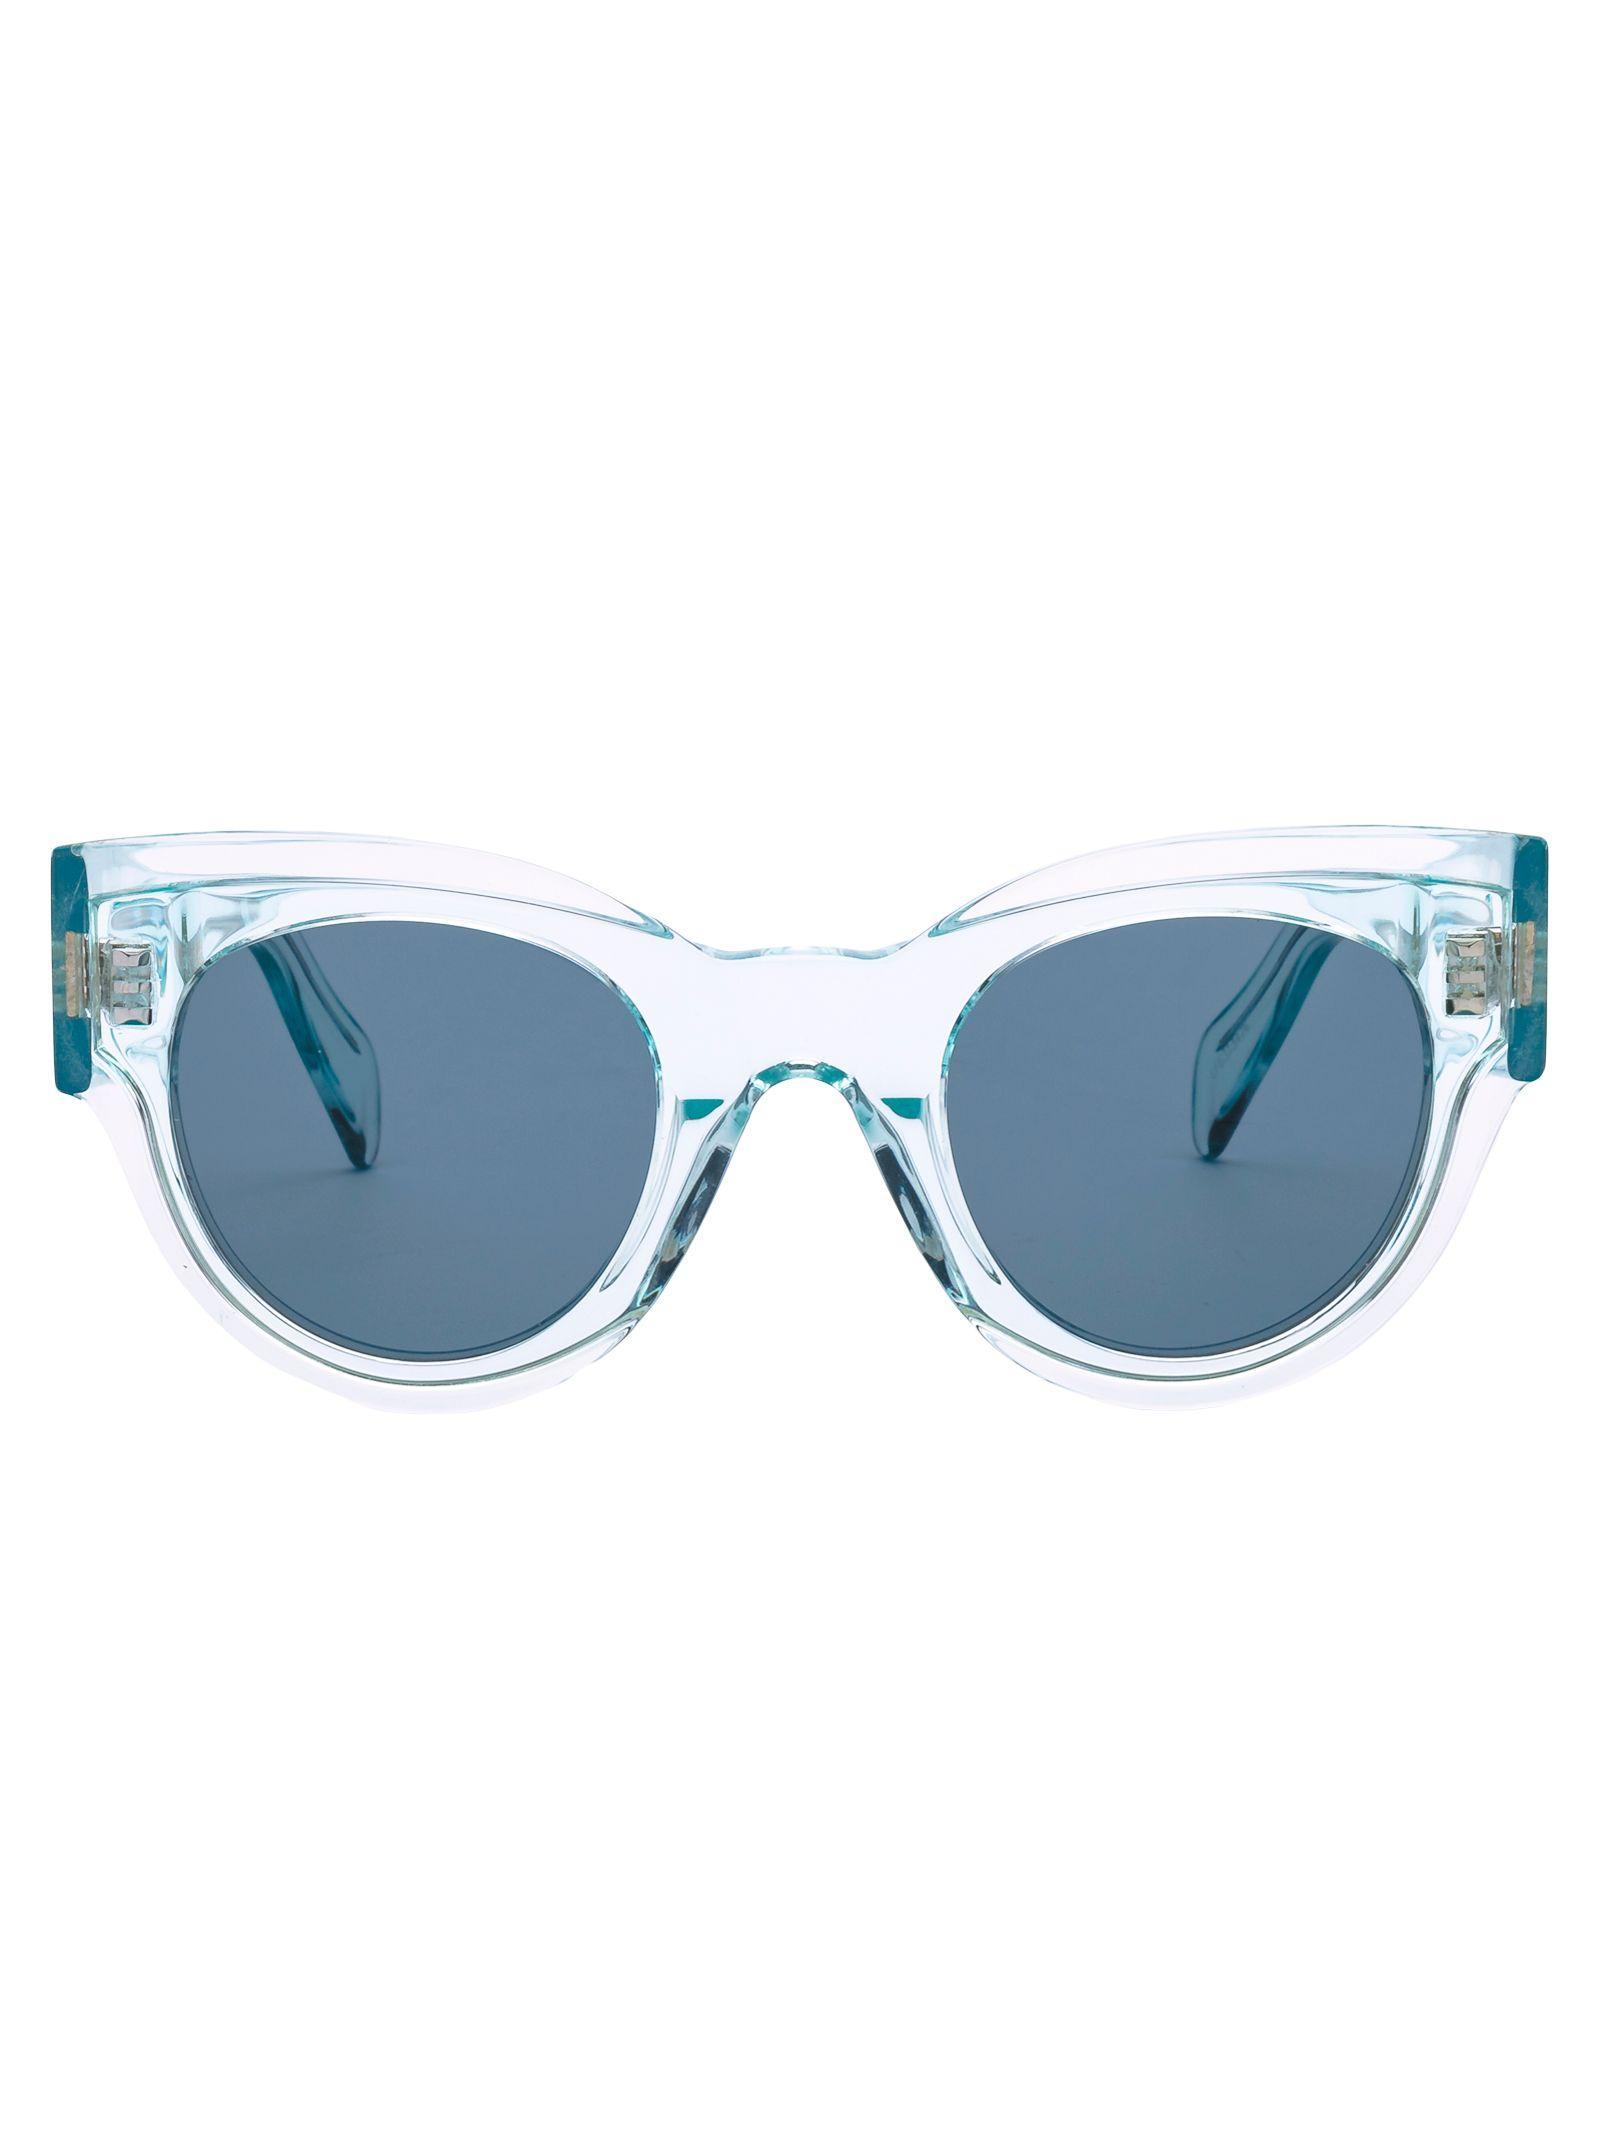 a2b68a9207 Lyst - Céline White Acetate Sunglasses in White